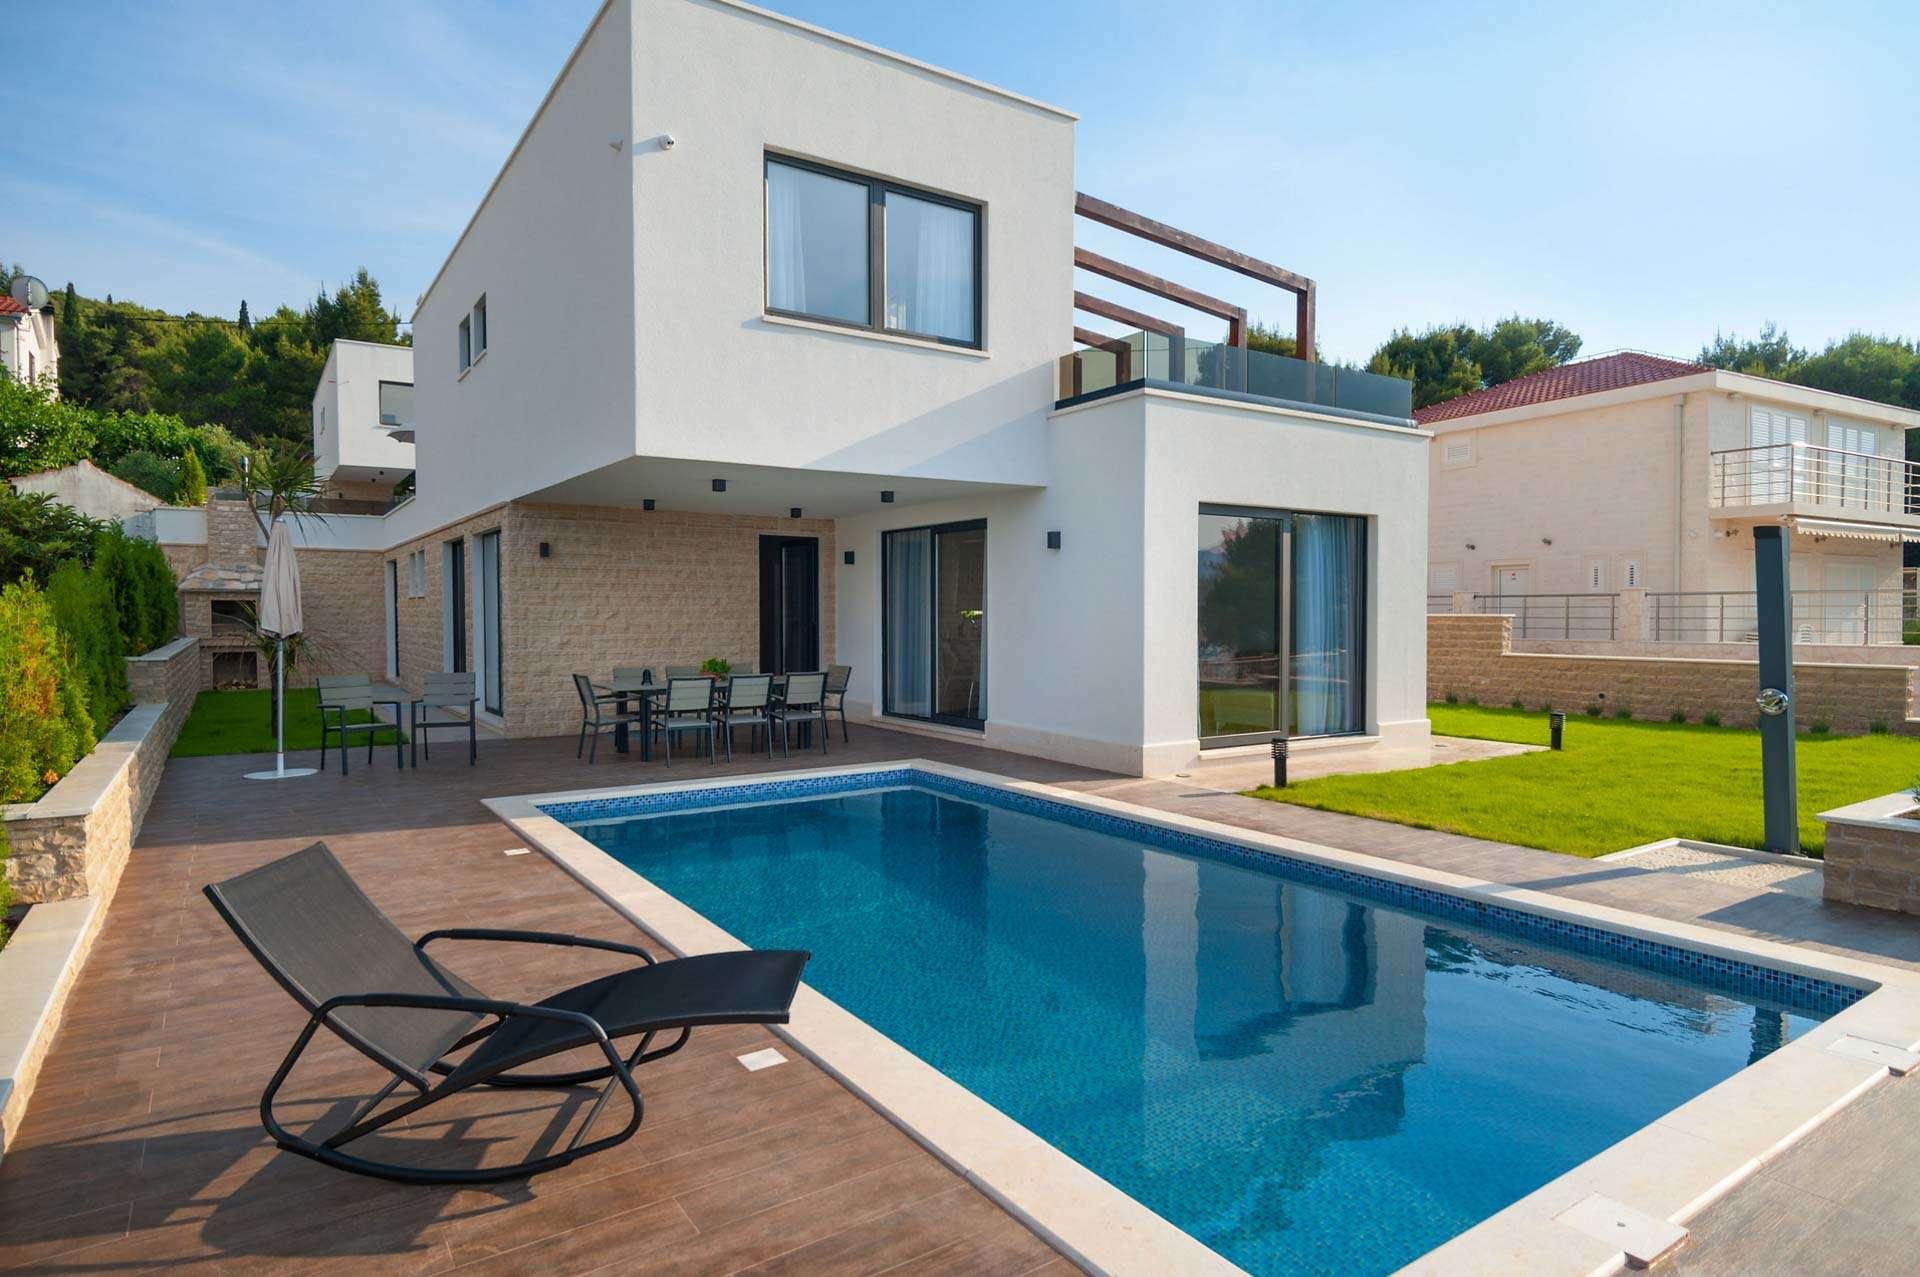 Luxury vacation rentals europe - Croatia - Dalmatia - Trogir - Trogir Twins 1 - Image 1/47